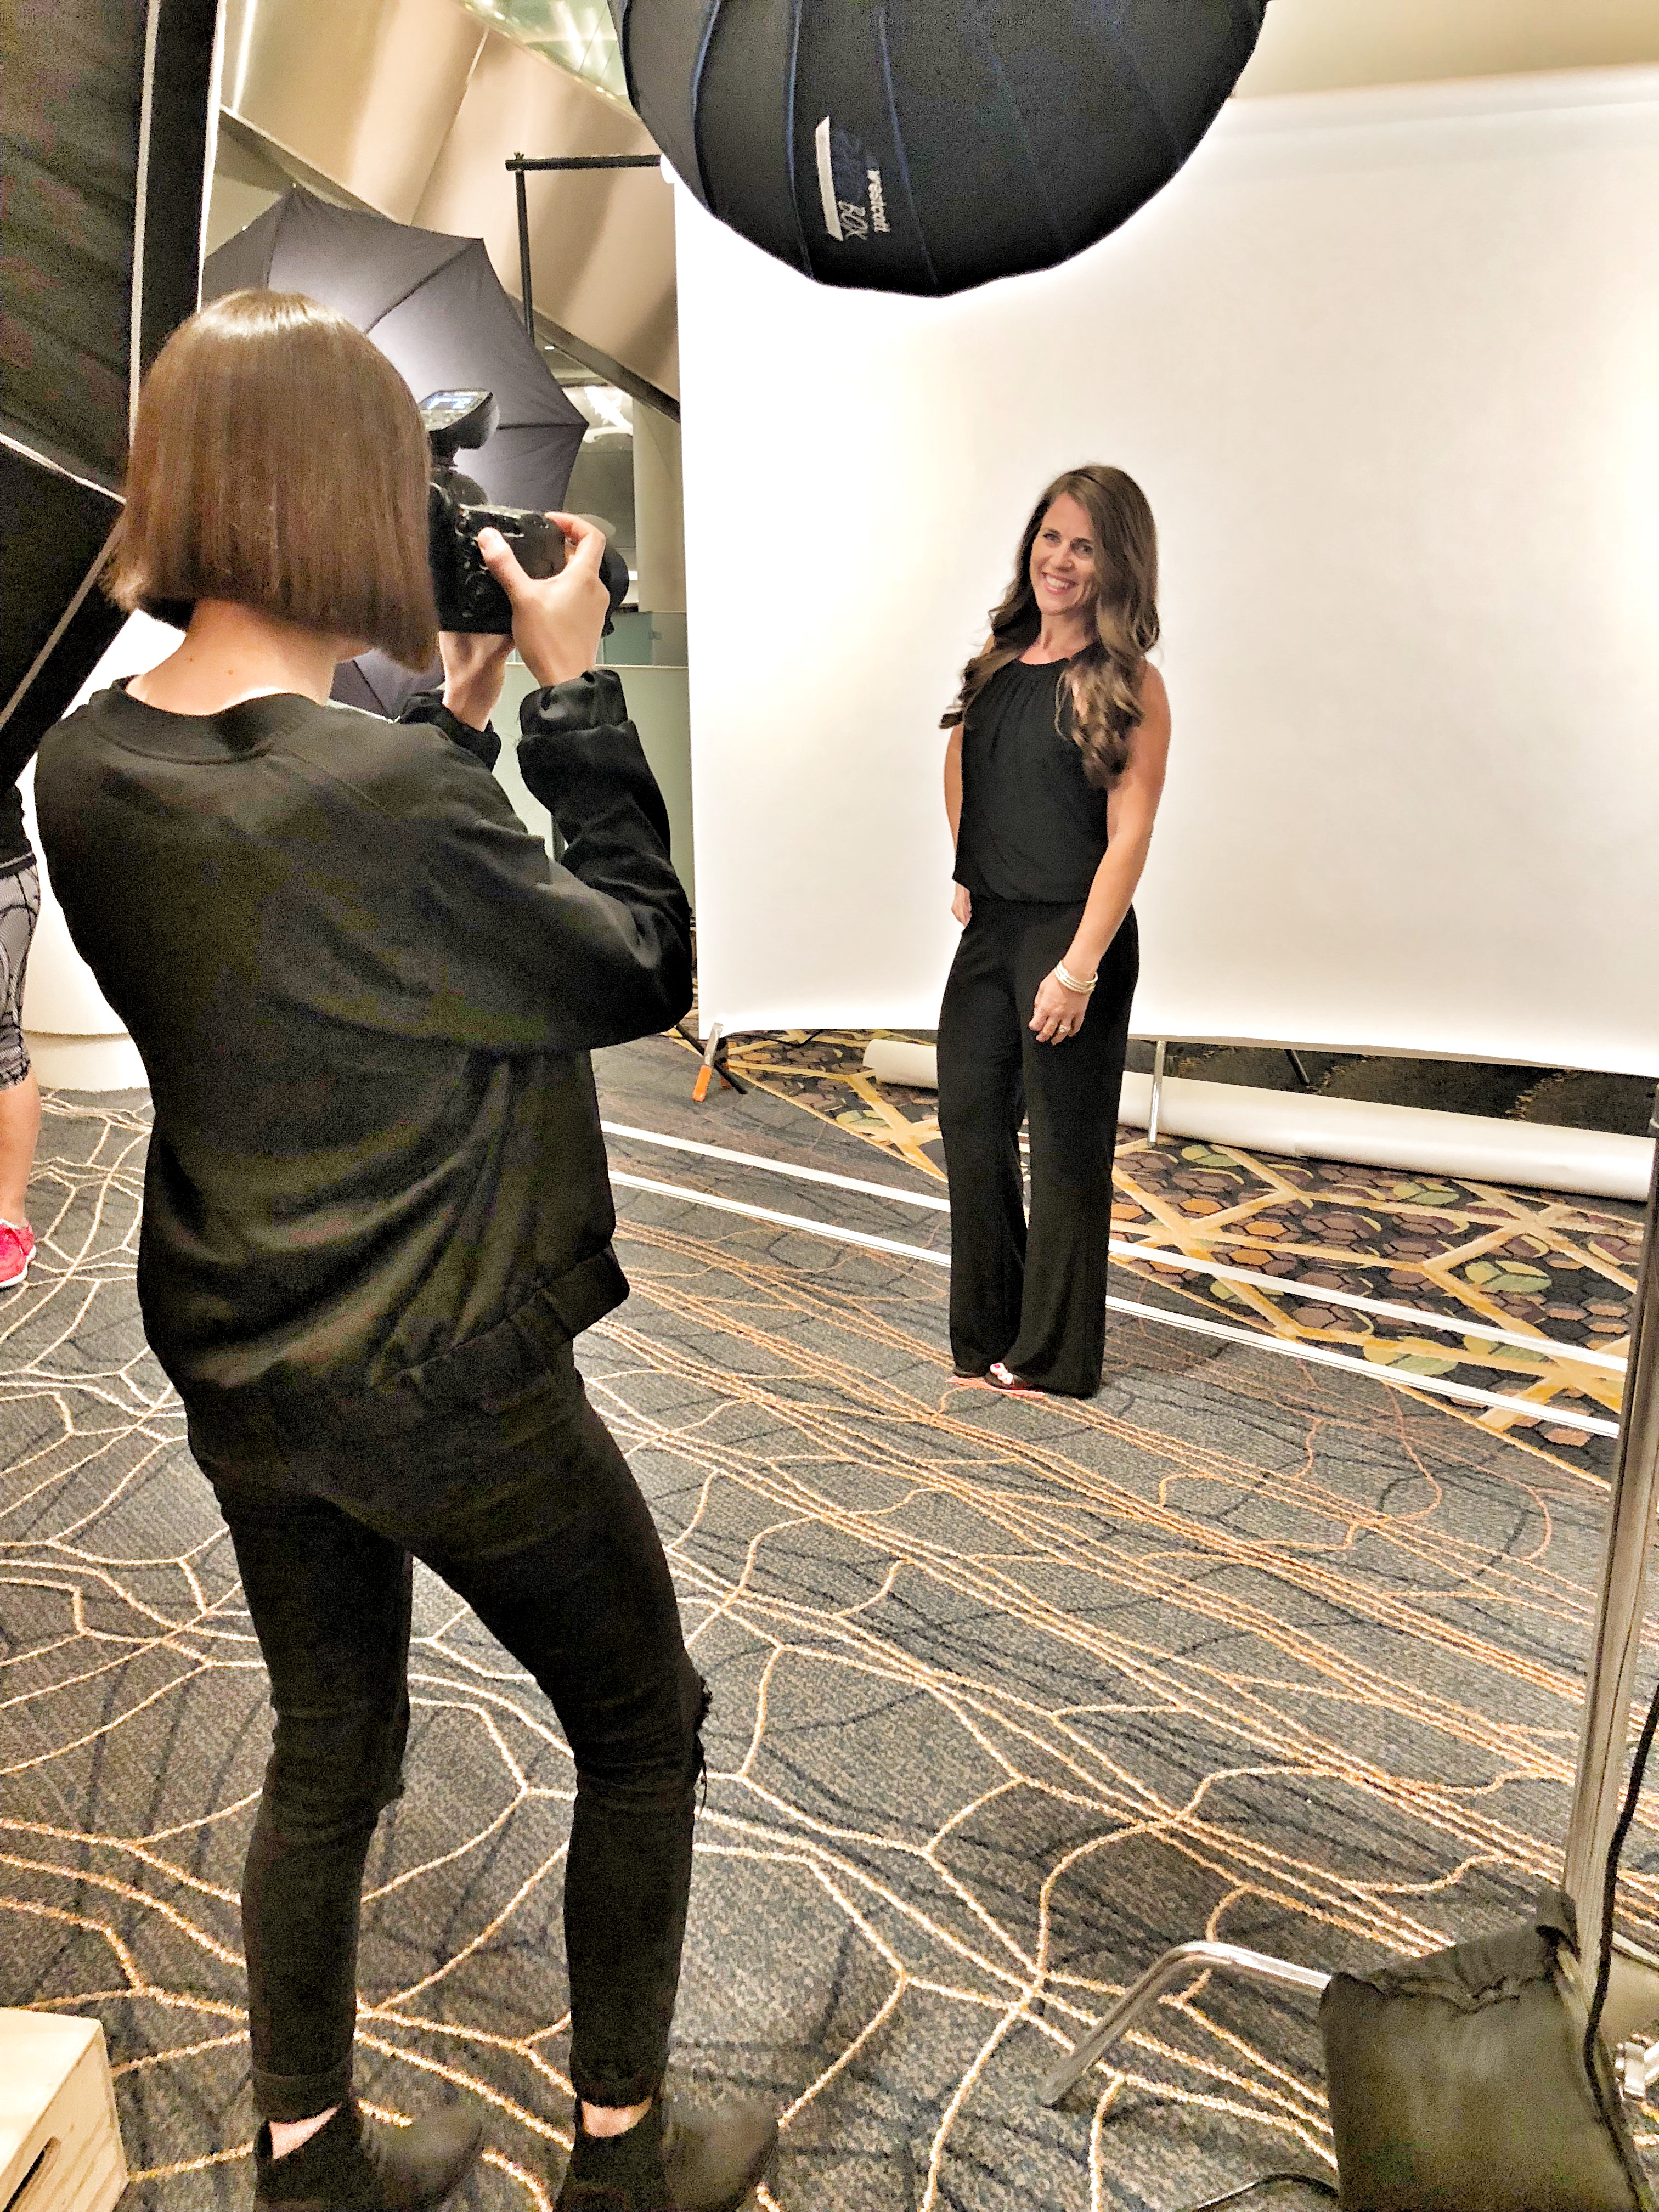 2018 Vegas Leadership elite night photo shoot